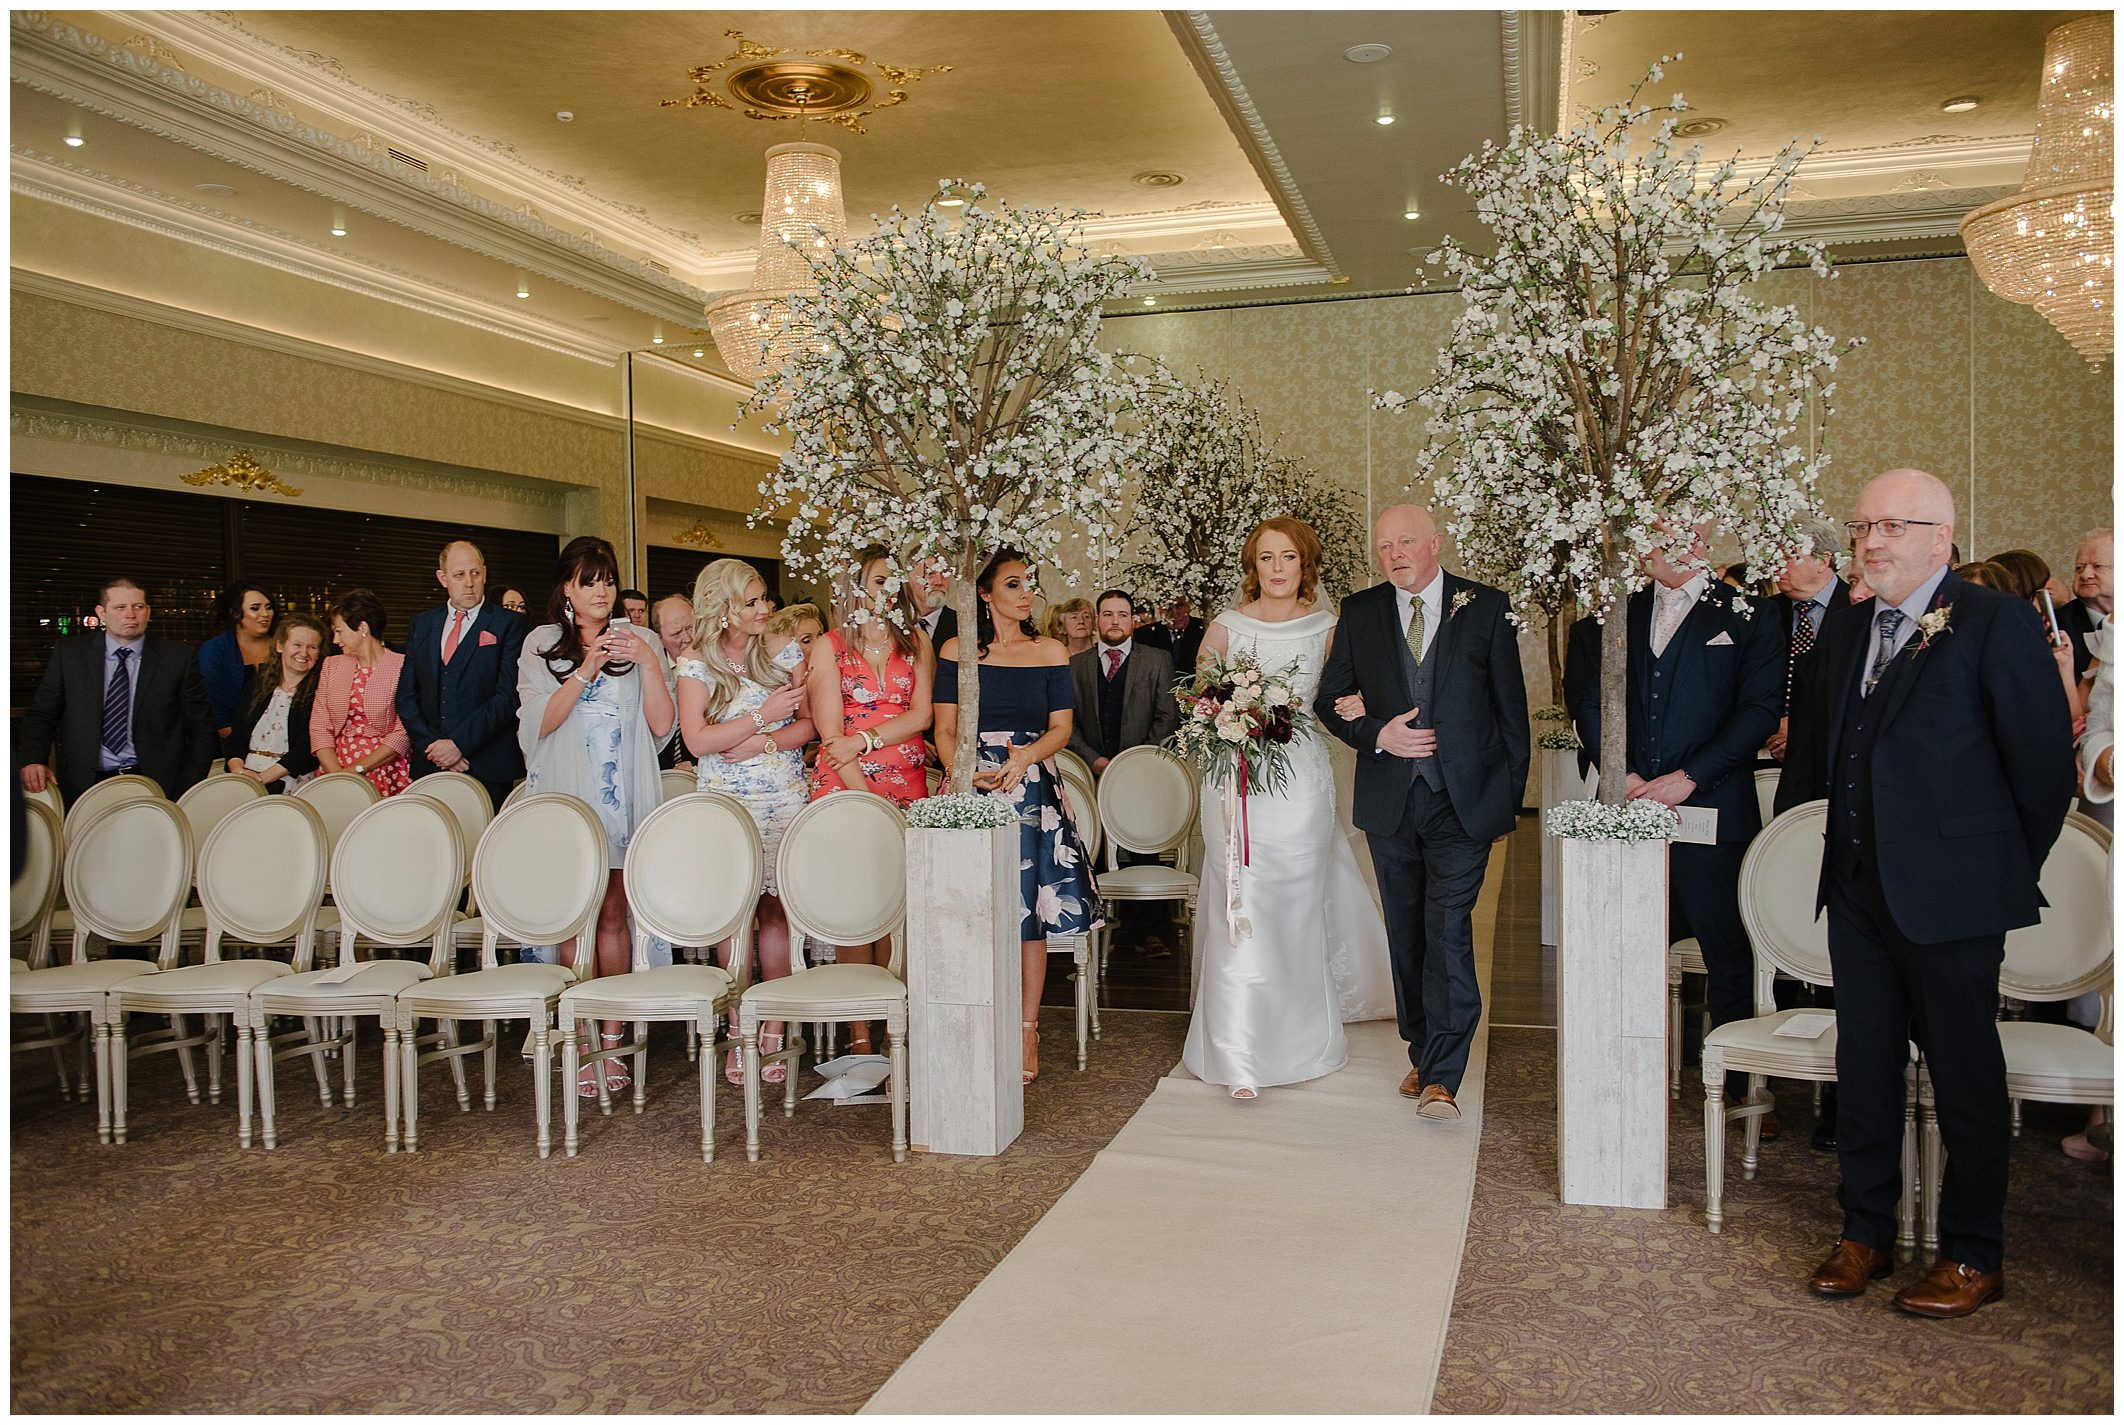 corick-house-wedding-hannah-gary-jude-browne-photography_0031.jpg